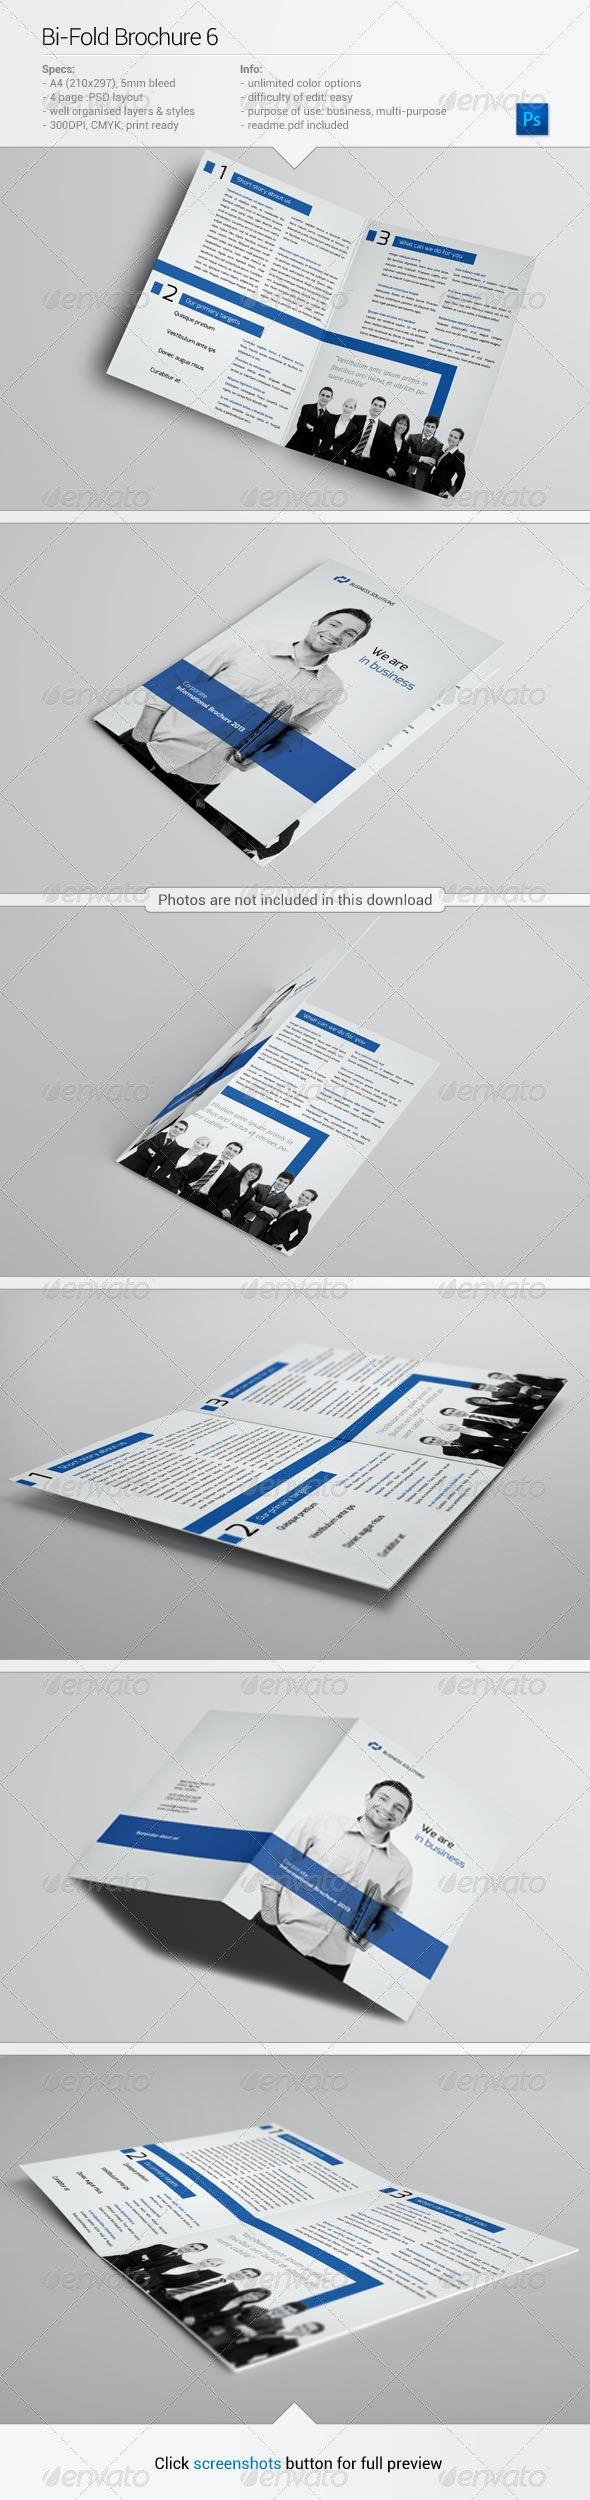 Bi-Fold Brochure 6 - Corporate Brochures